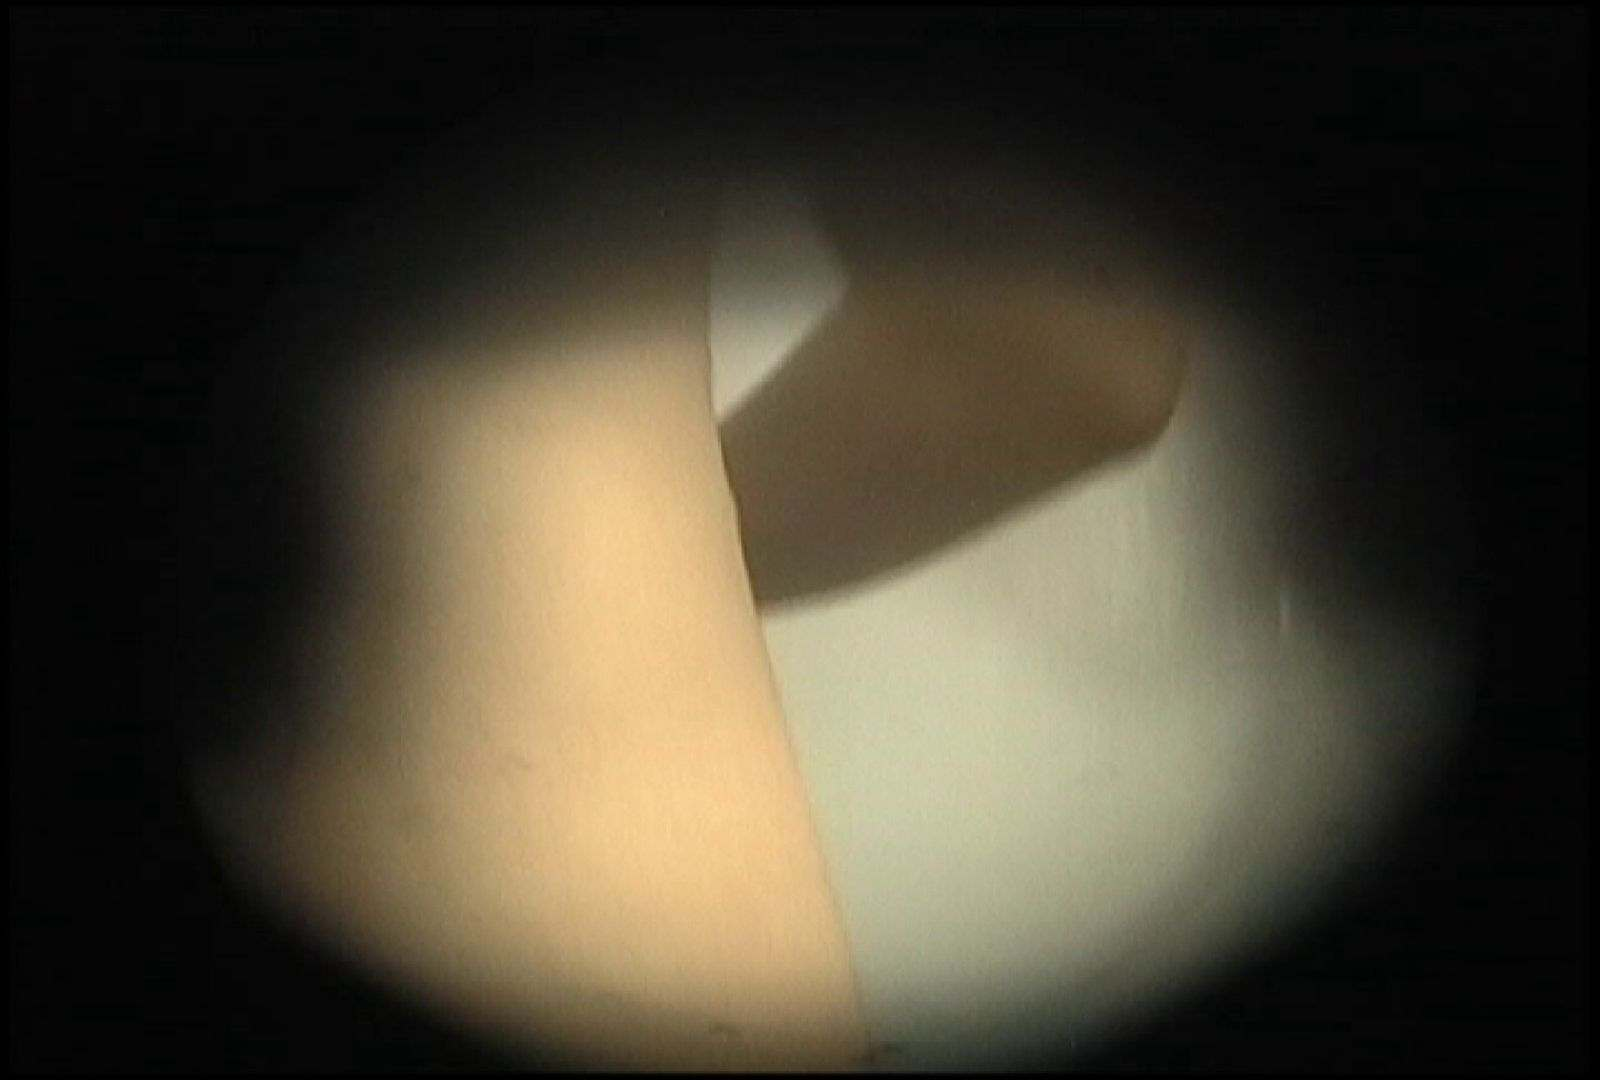 No.132 蜘蛛の糸よろしくプラプラ垂れる紐を望むお尻を 接写 セックス無修正動画無料 97画像 65